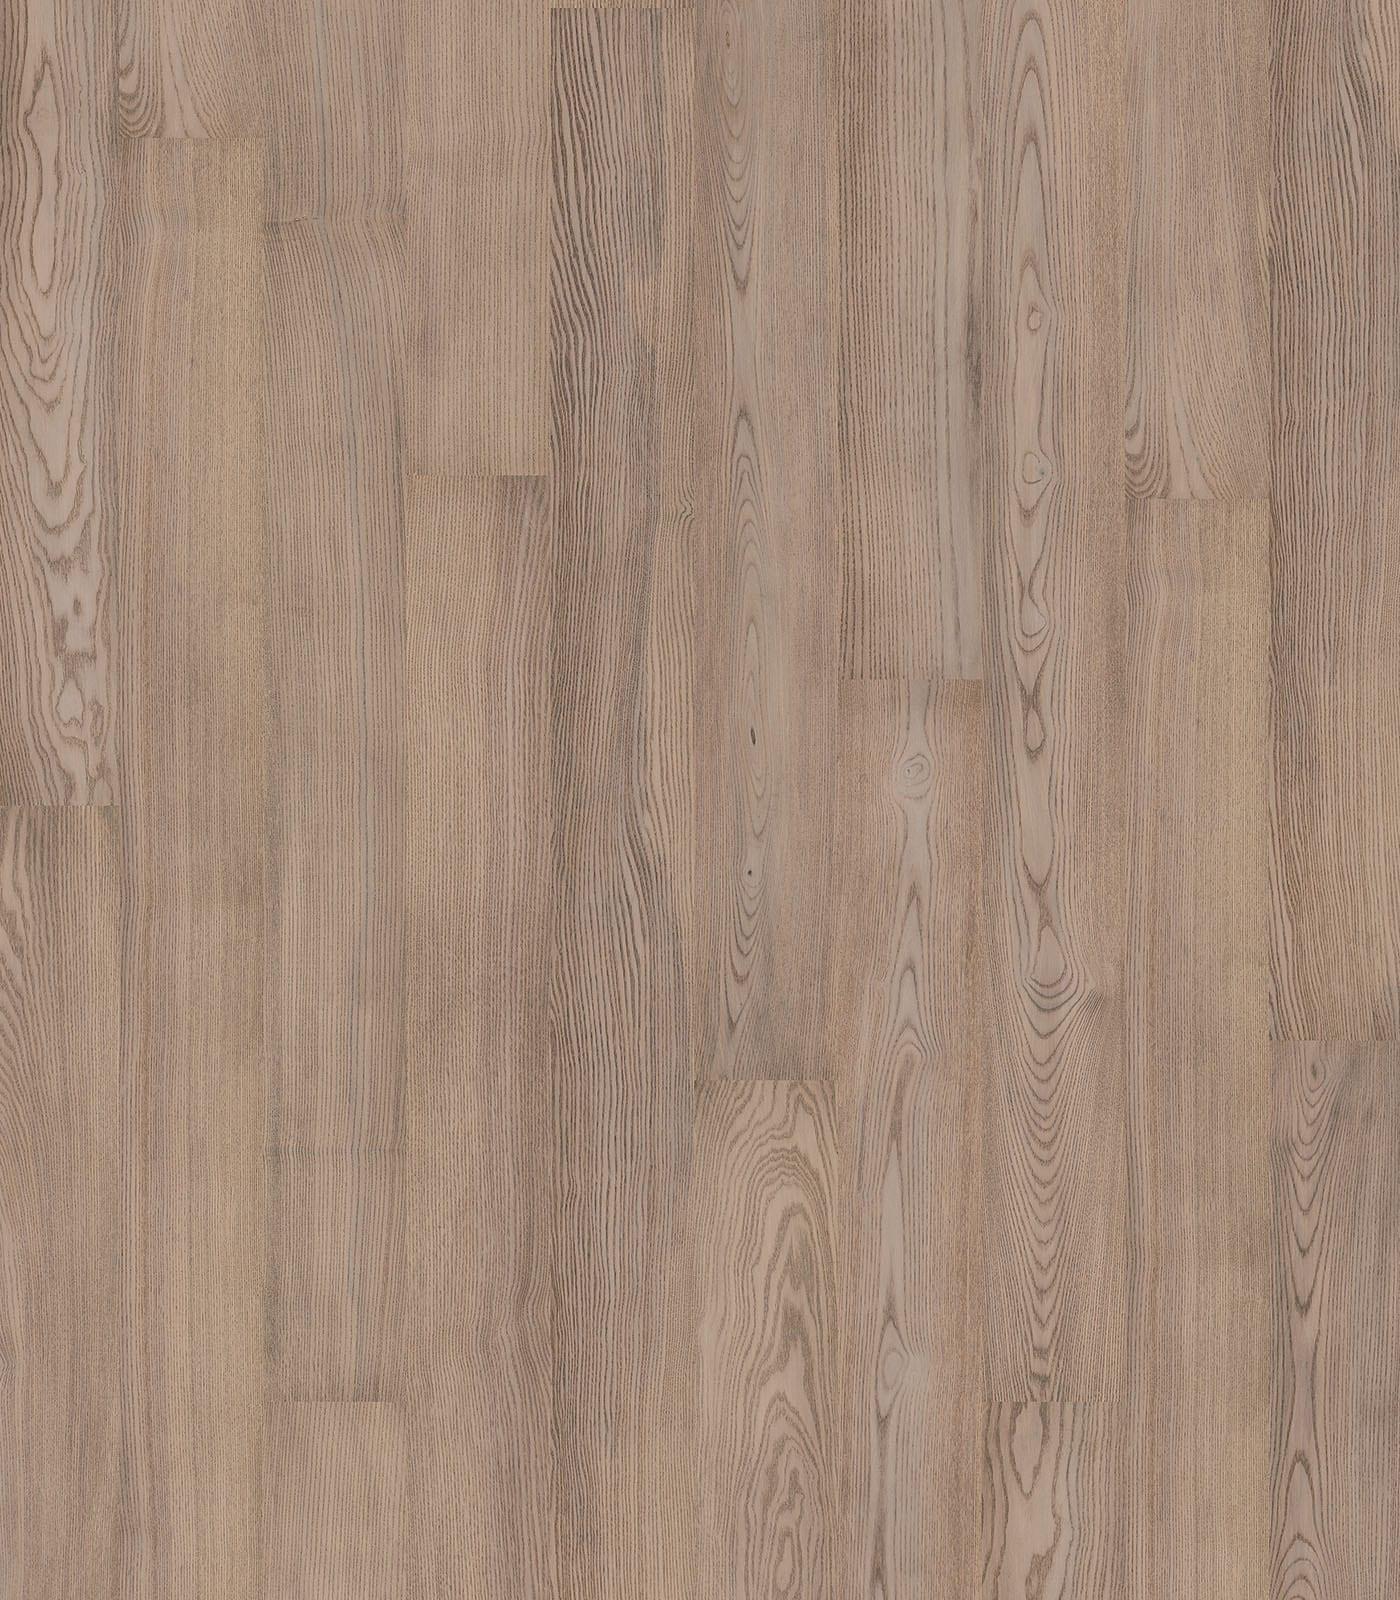 Stockholm - European Ash Floors - After Oak Collection - Flat